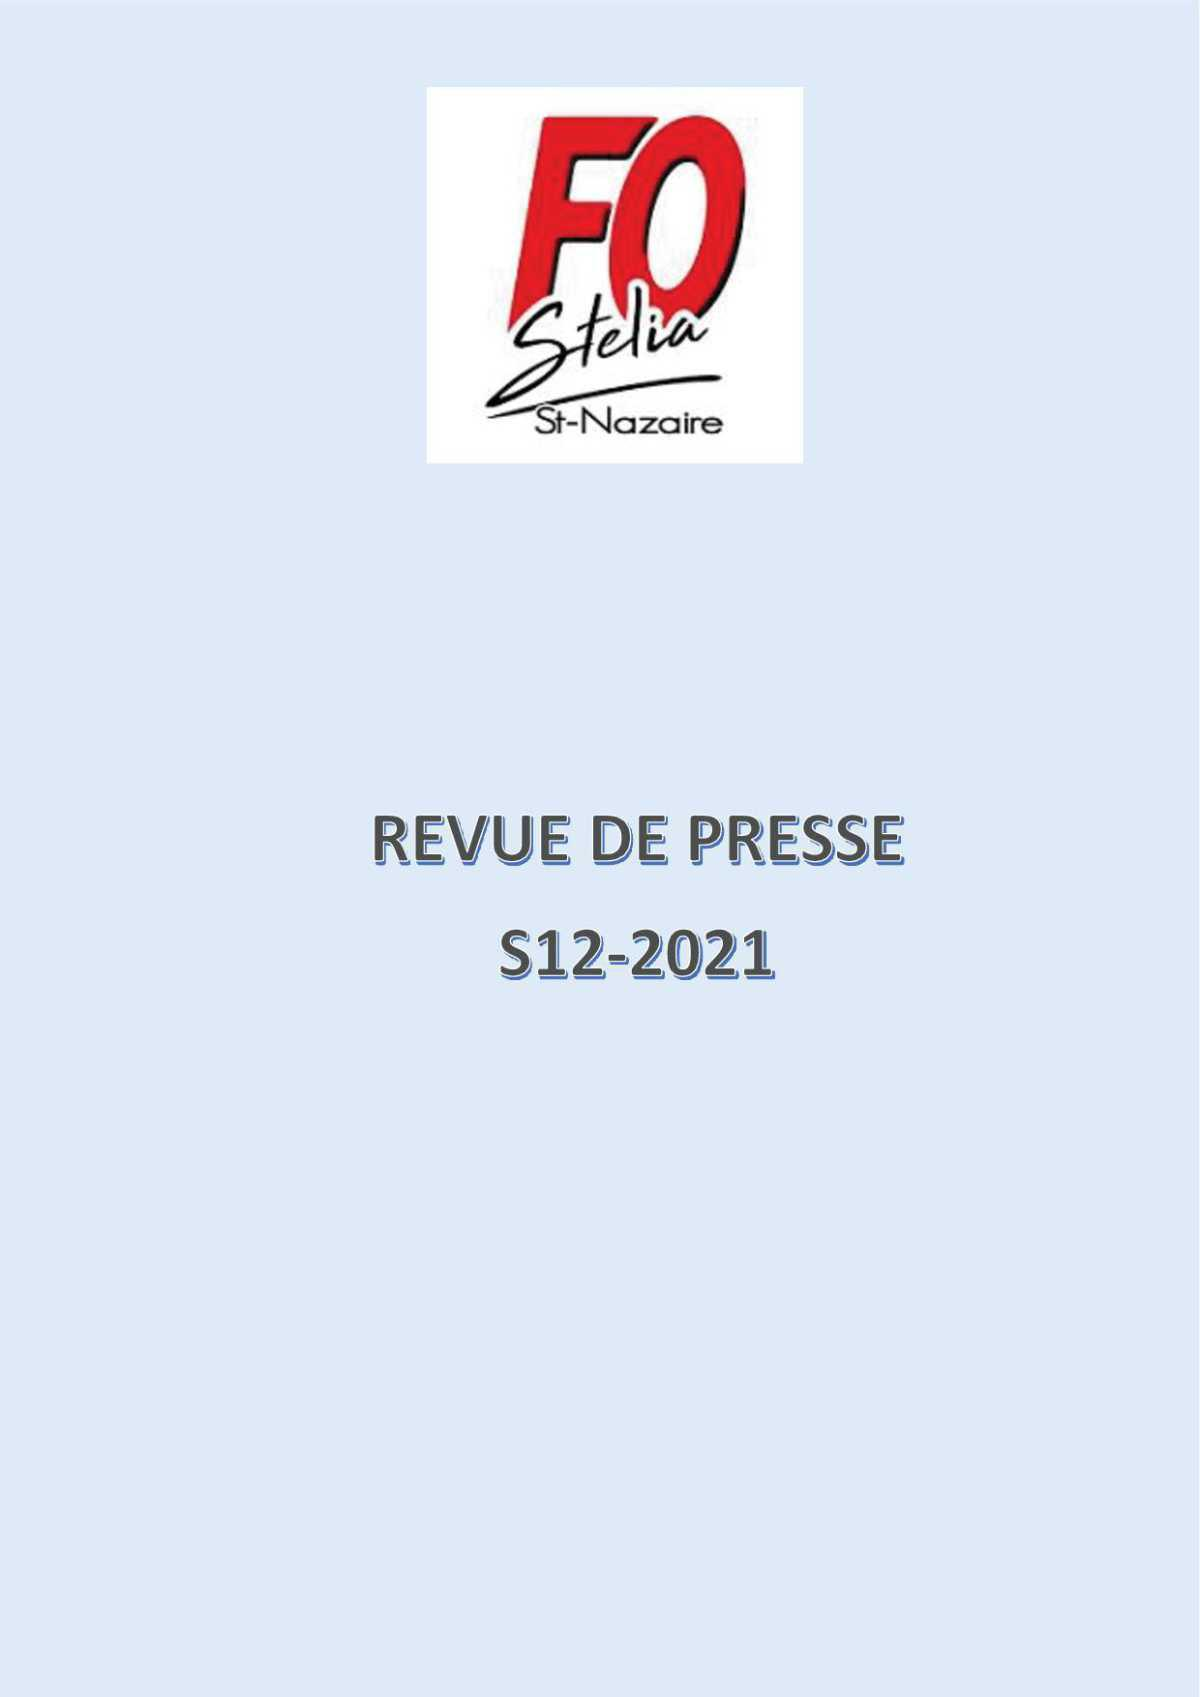 REVUE DE PRESSE S12